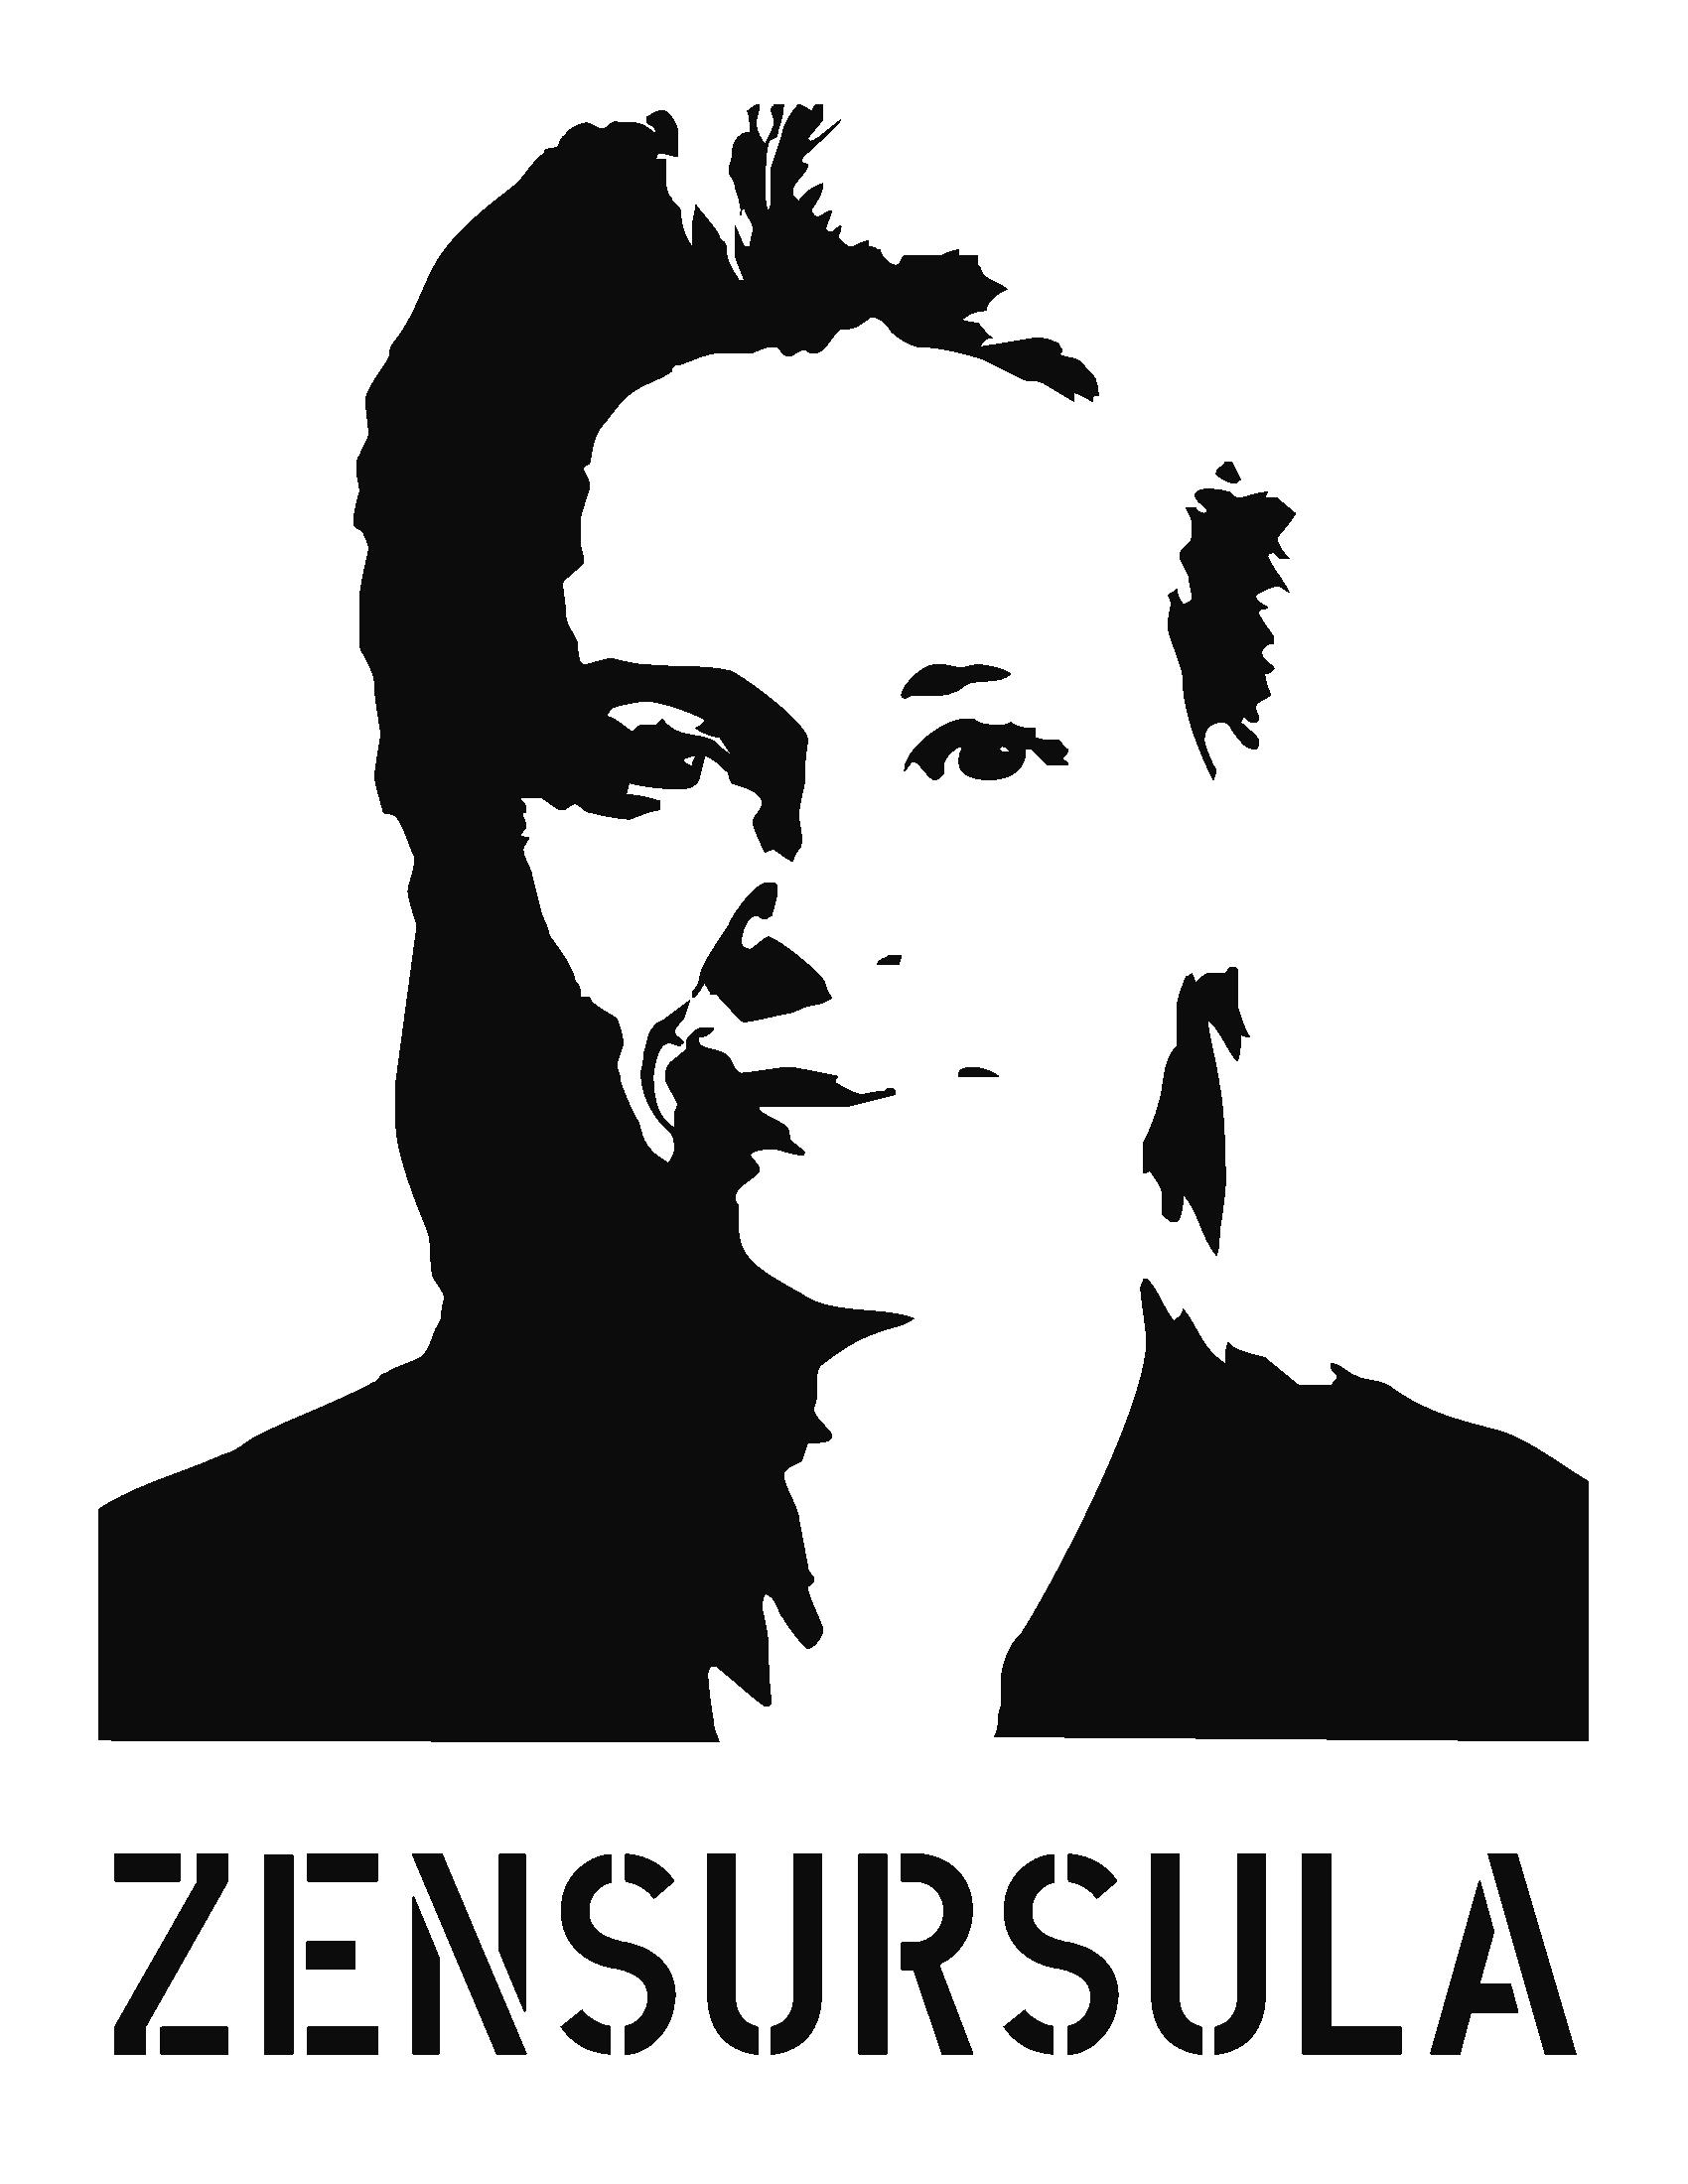 zensursula_seite_01-1